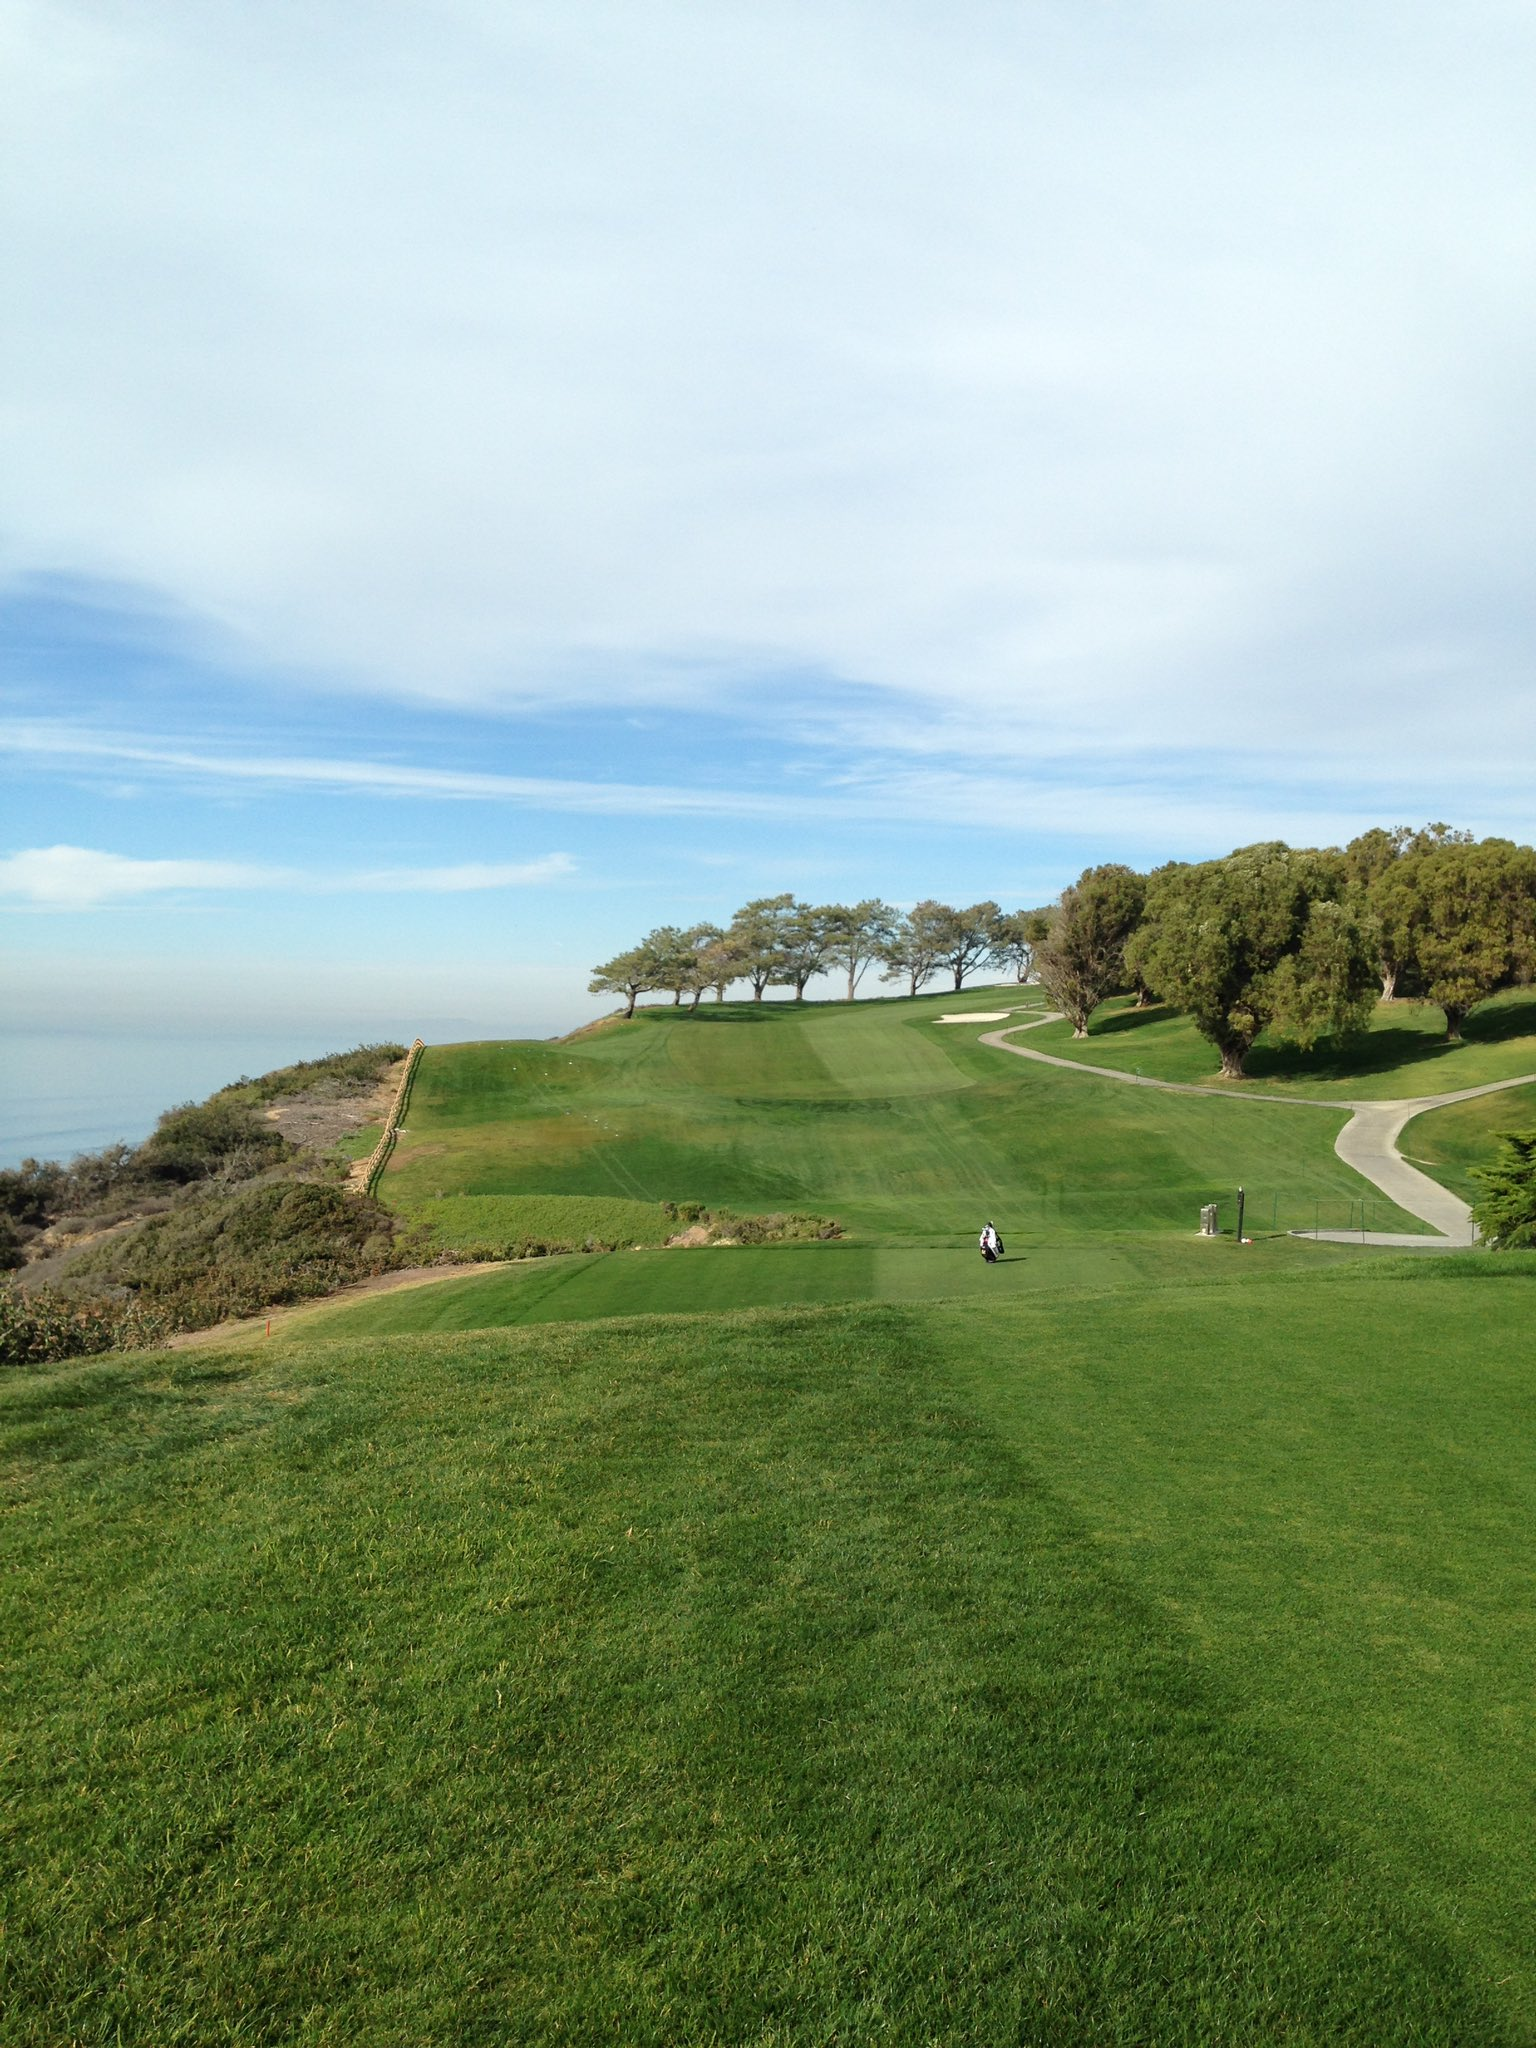 Official Home Of Golf And The Fedexcup Snap Circuits Repair Haha Bird Maxhoma23